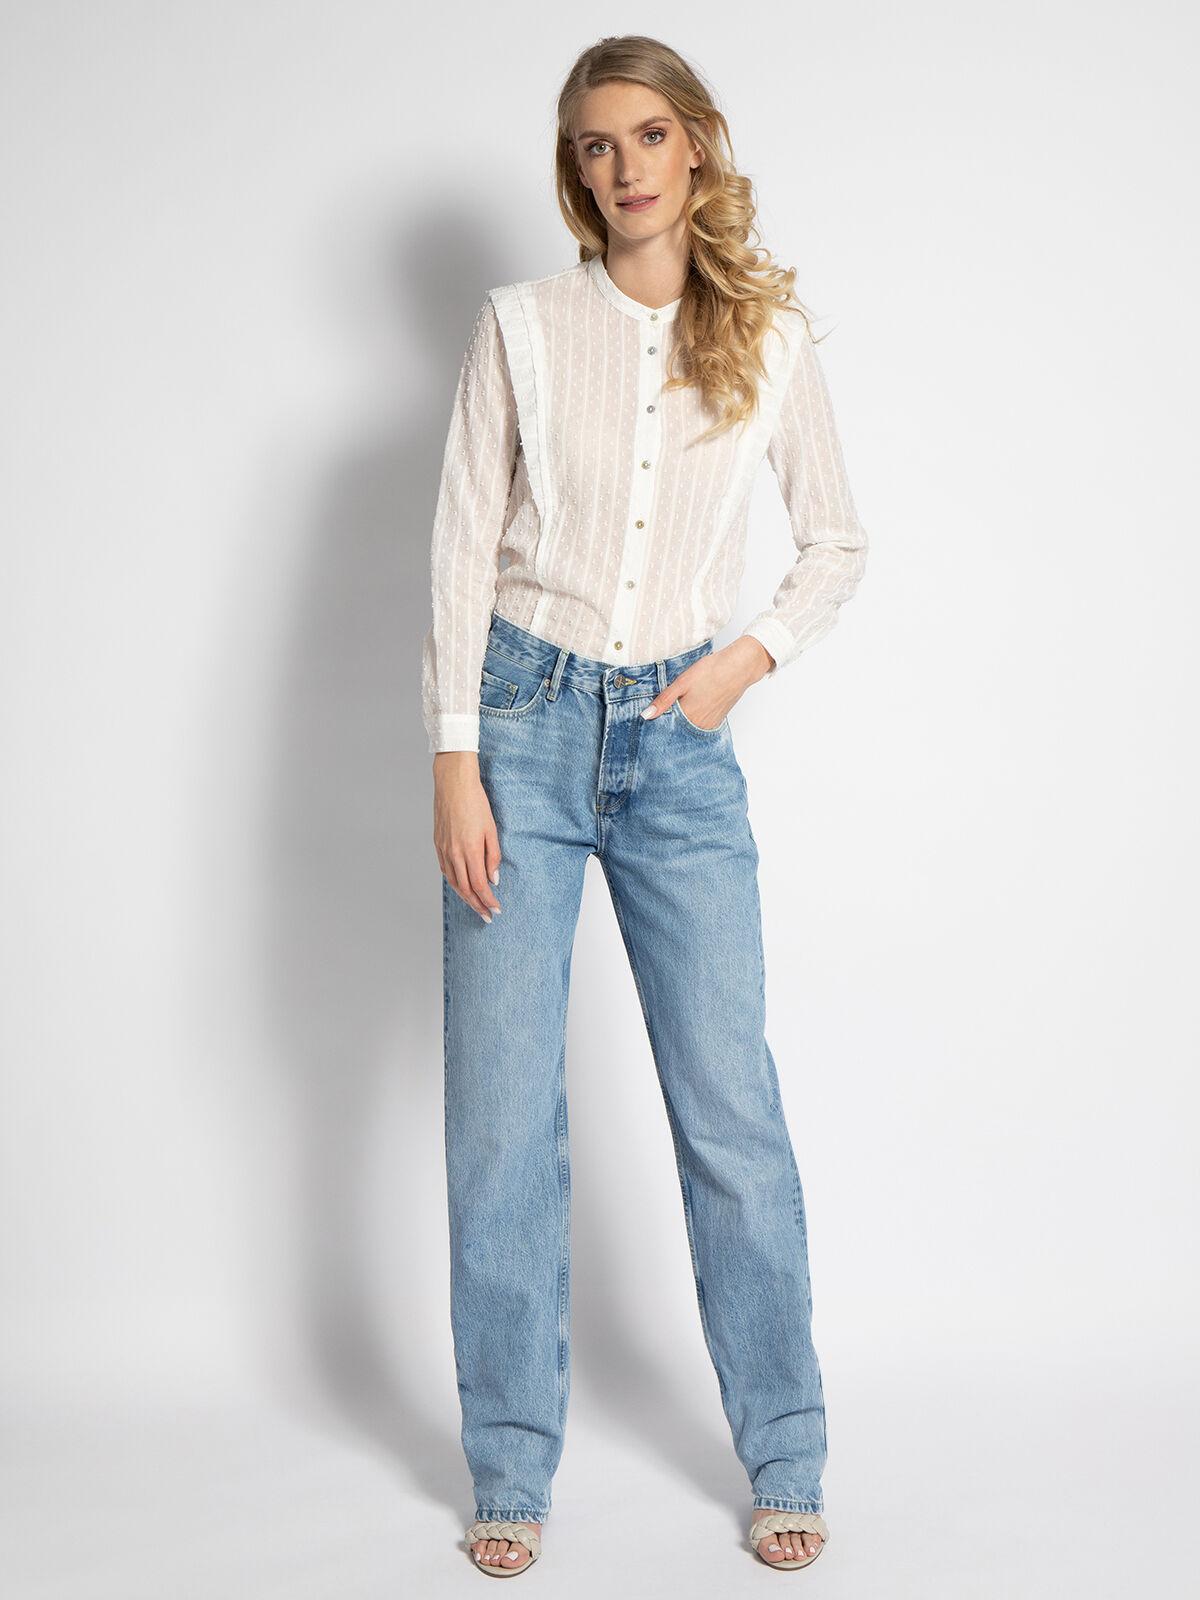 Dua Lipa Jeans